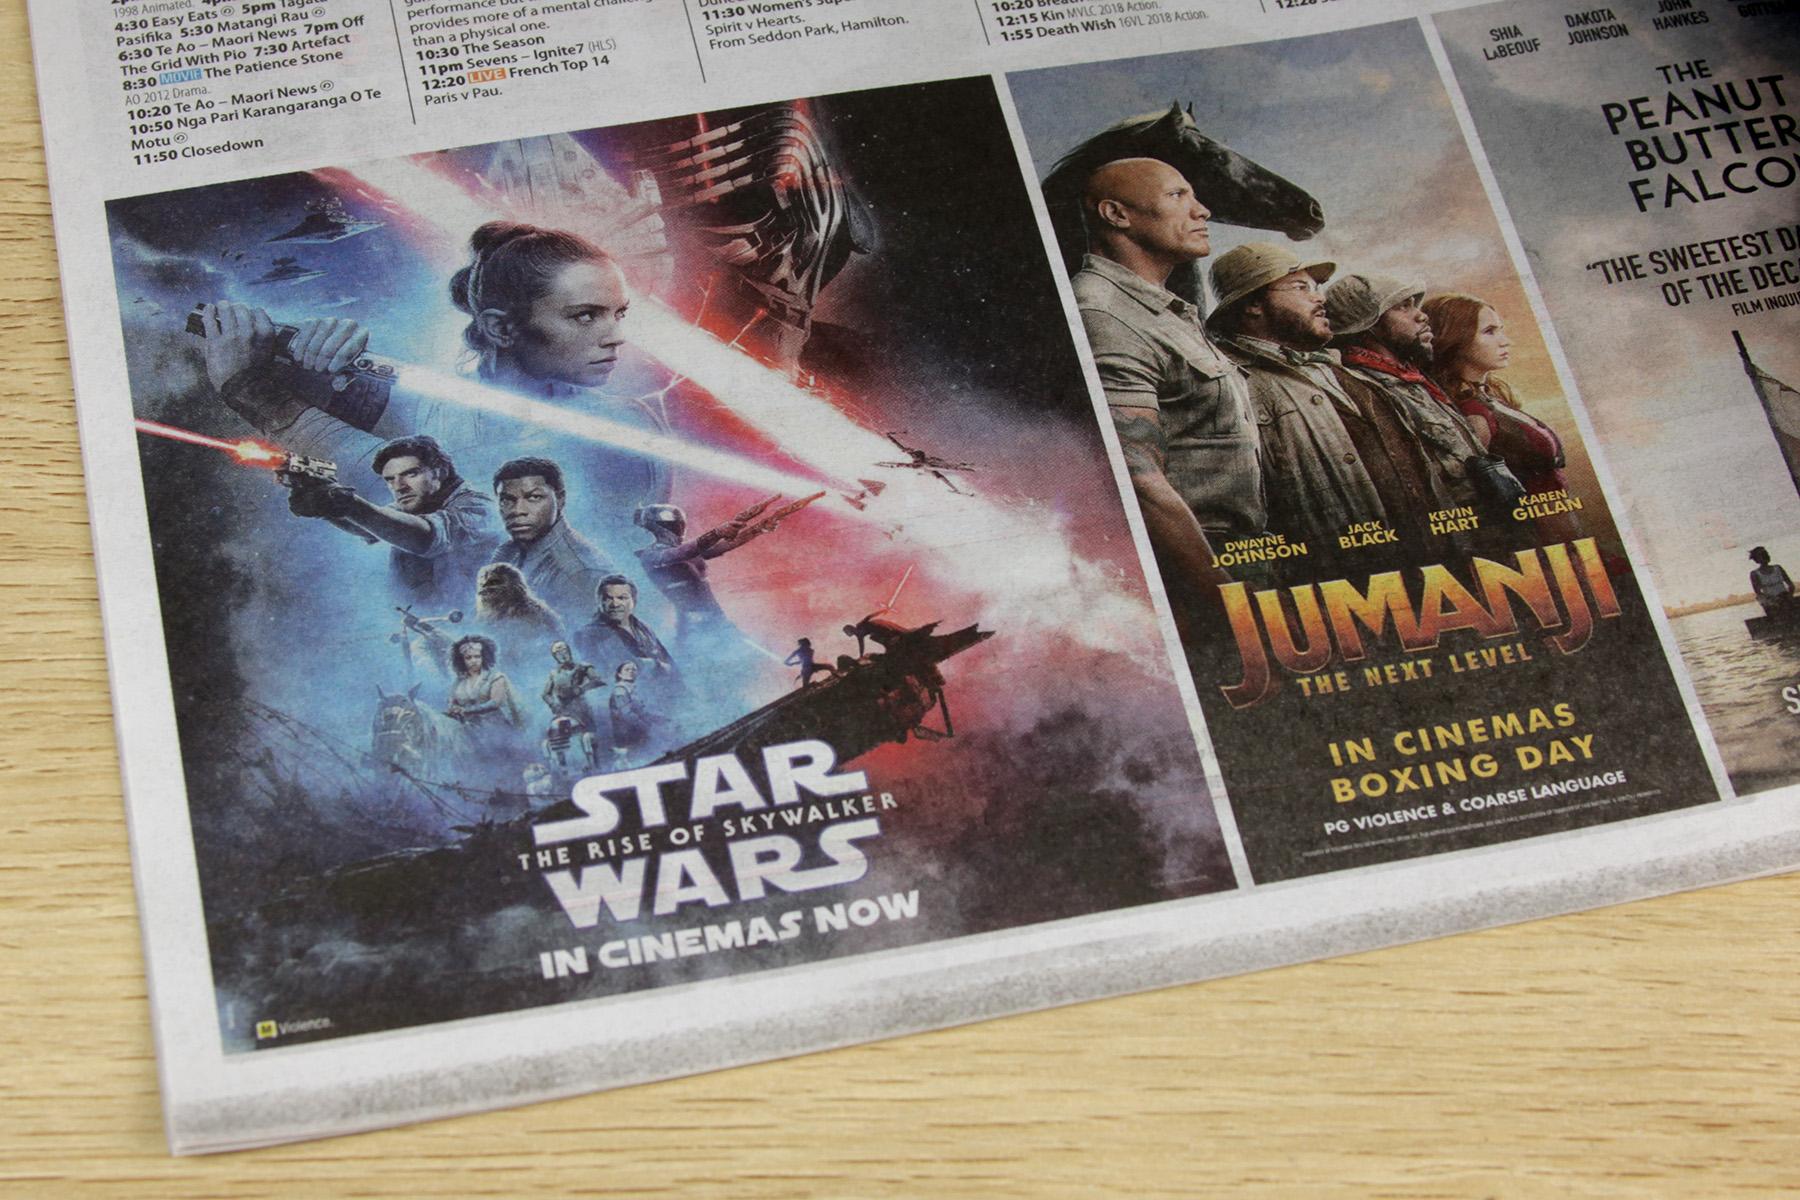 Sunday Star Times, 22 Dec 2019